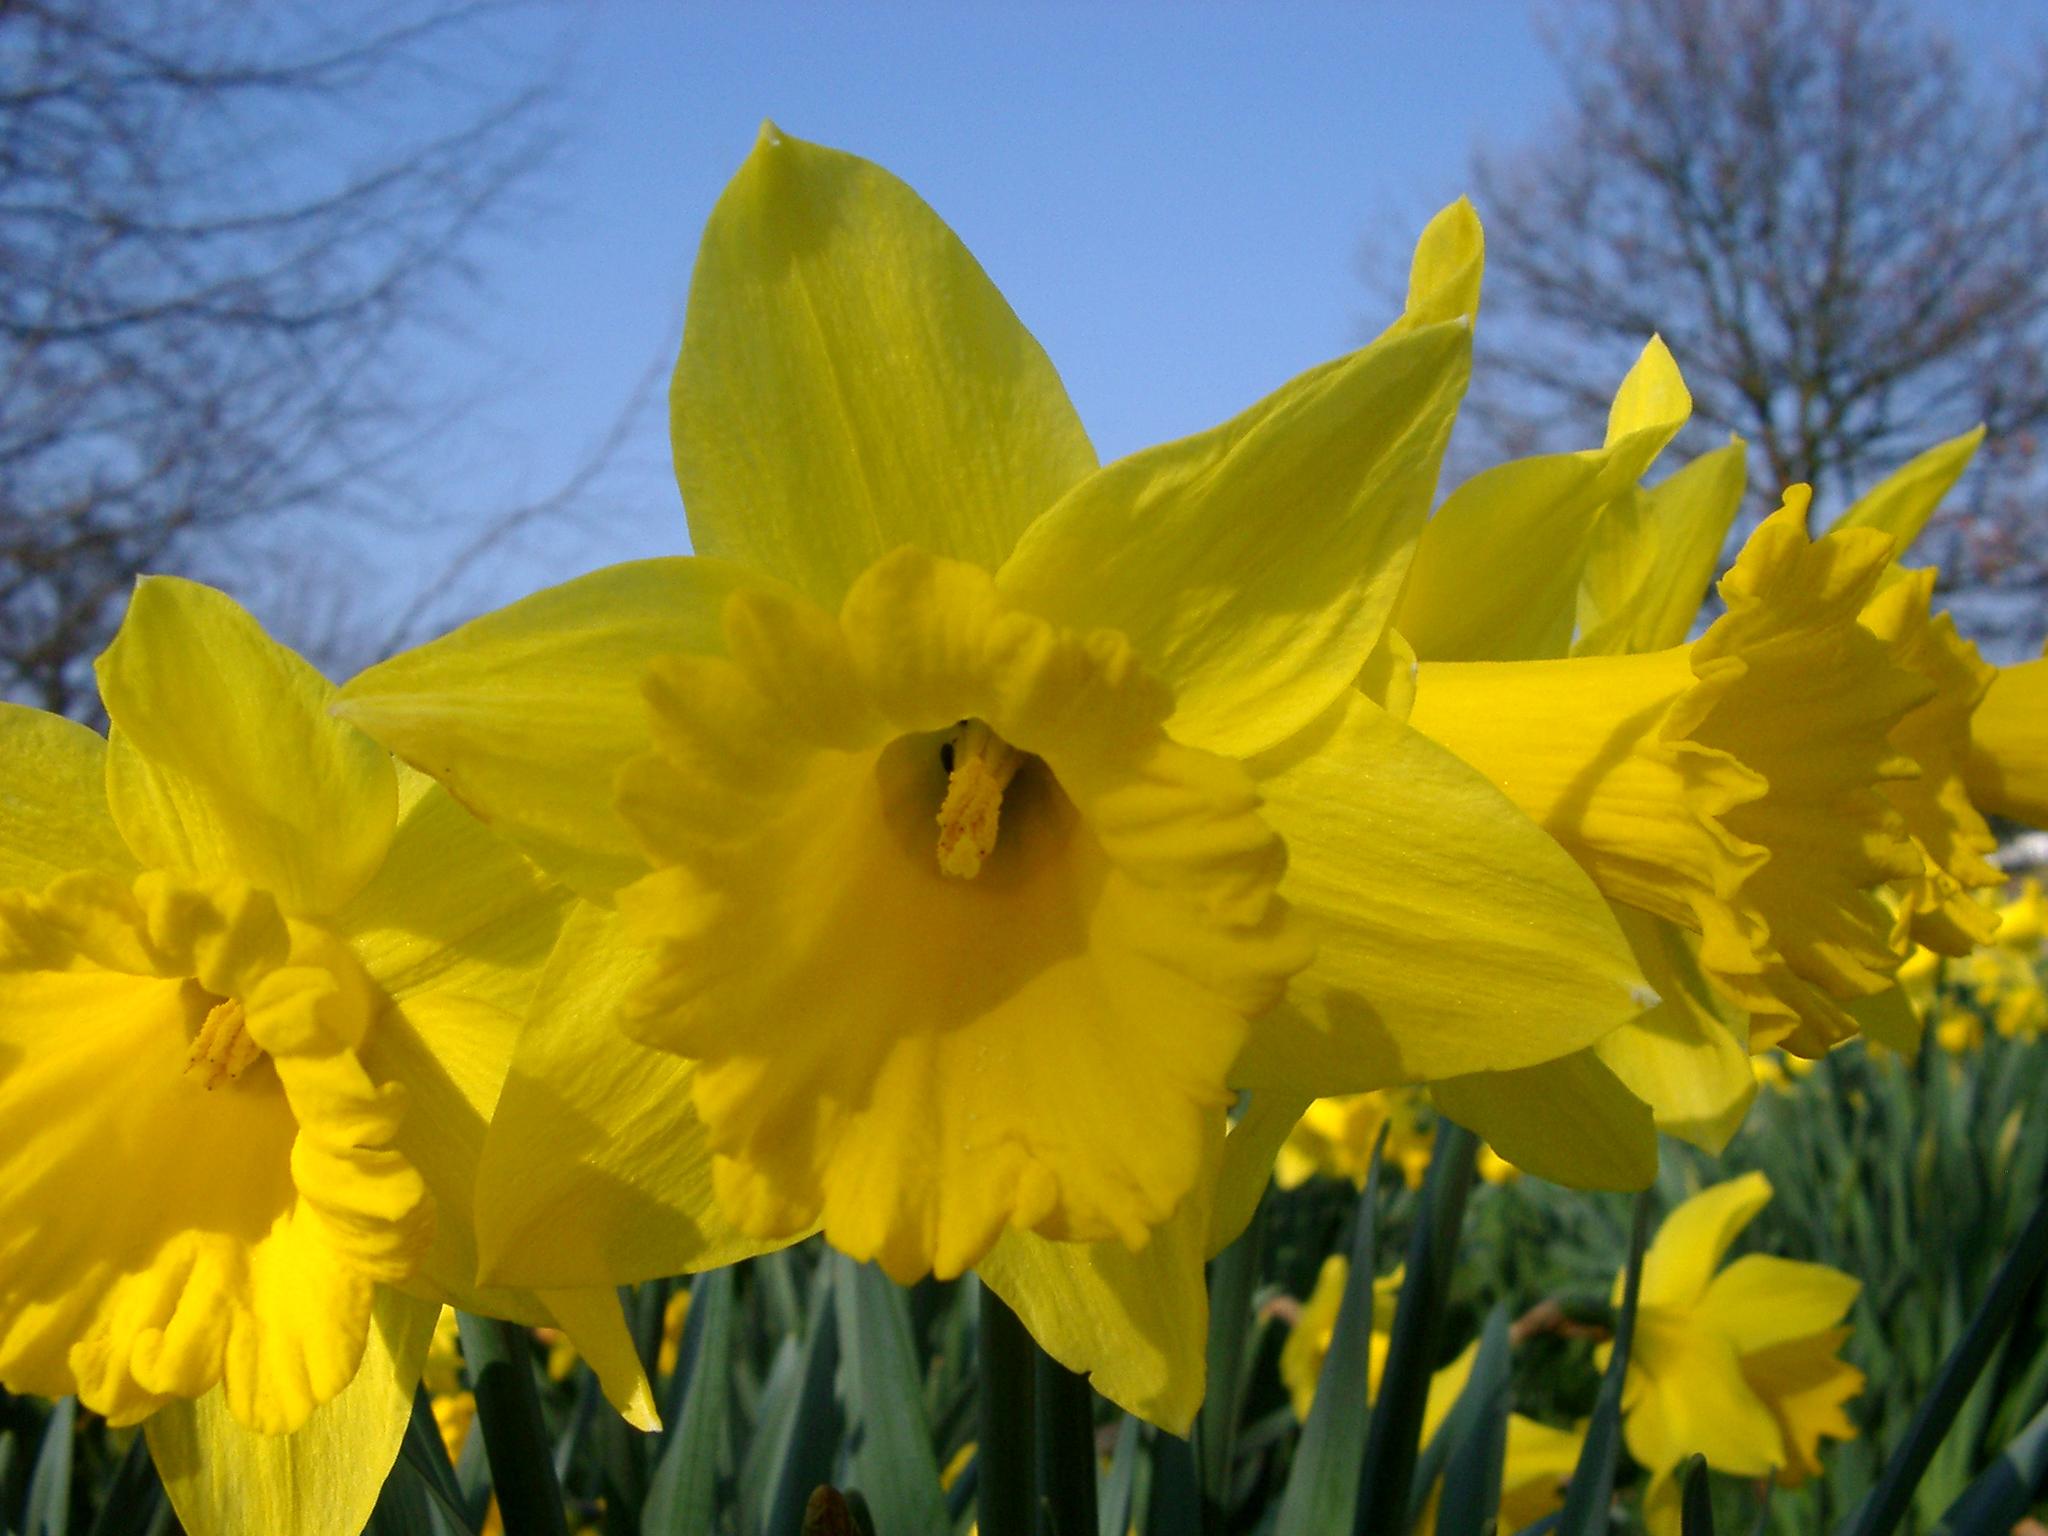 Field Wallpaper Hd Free Stock Photo Of Daffodil Photoeverywhere